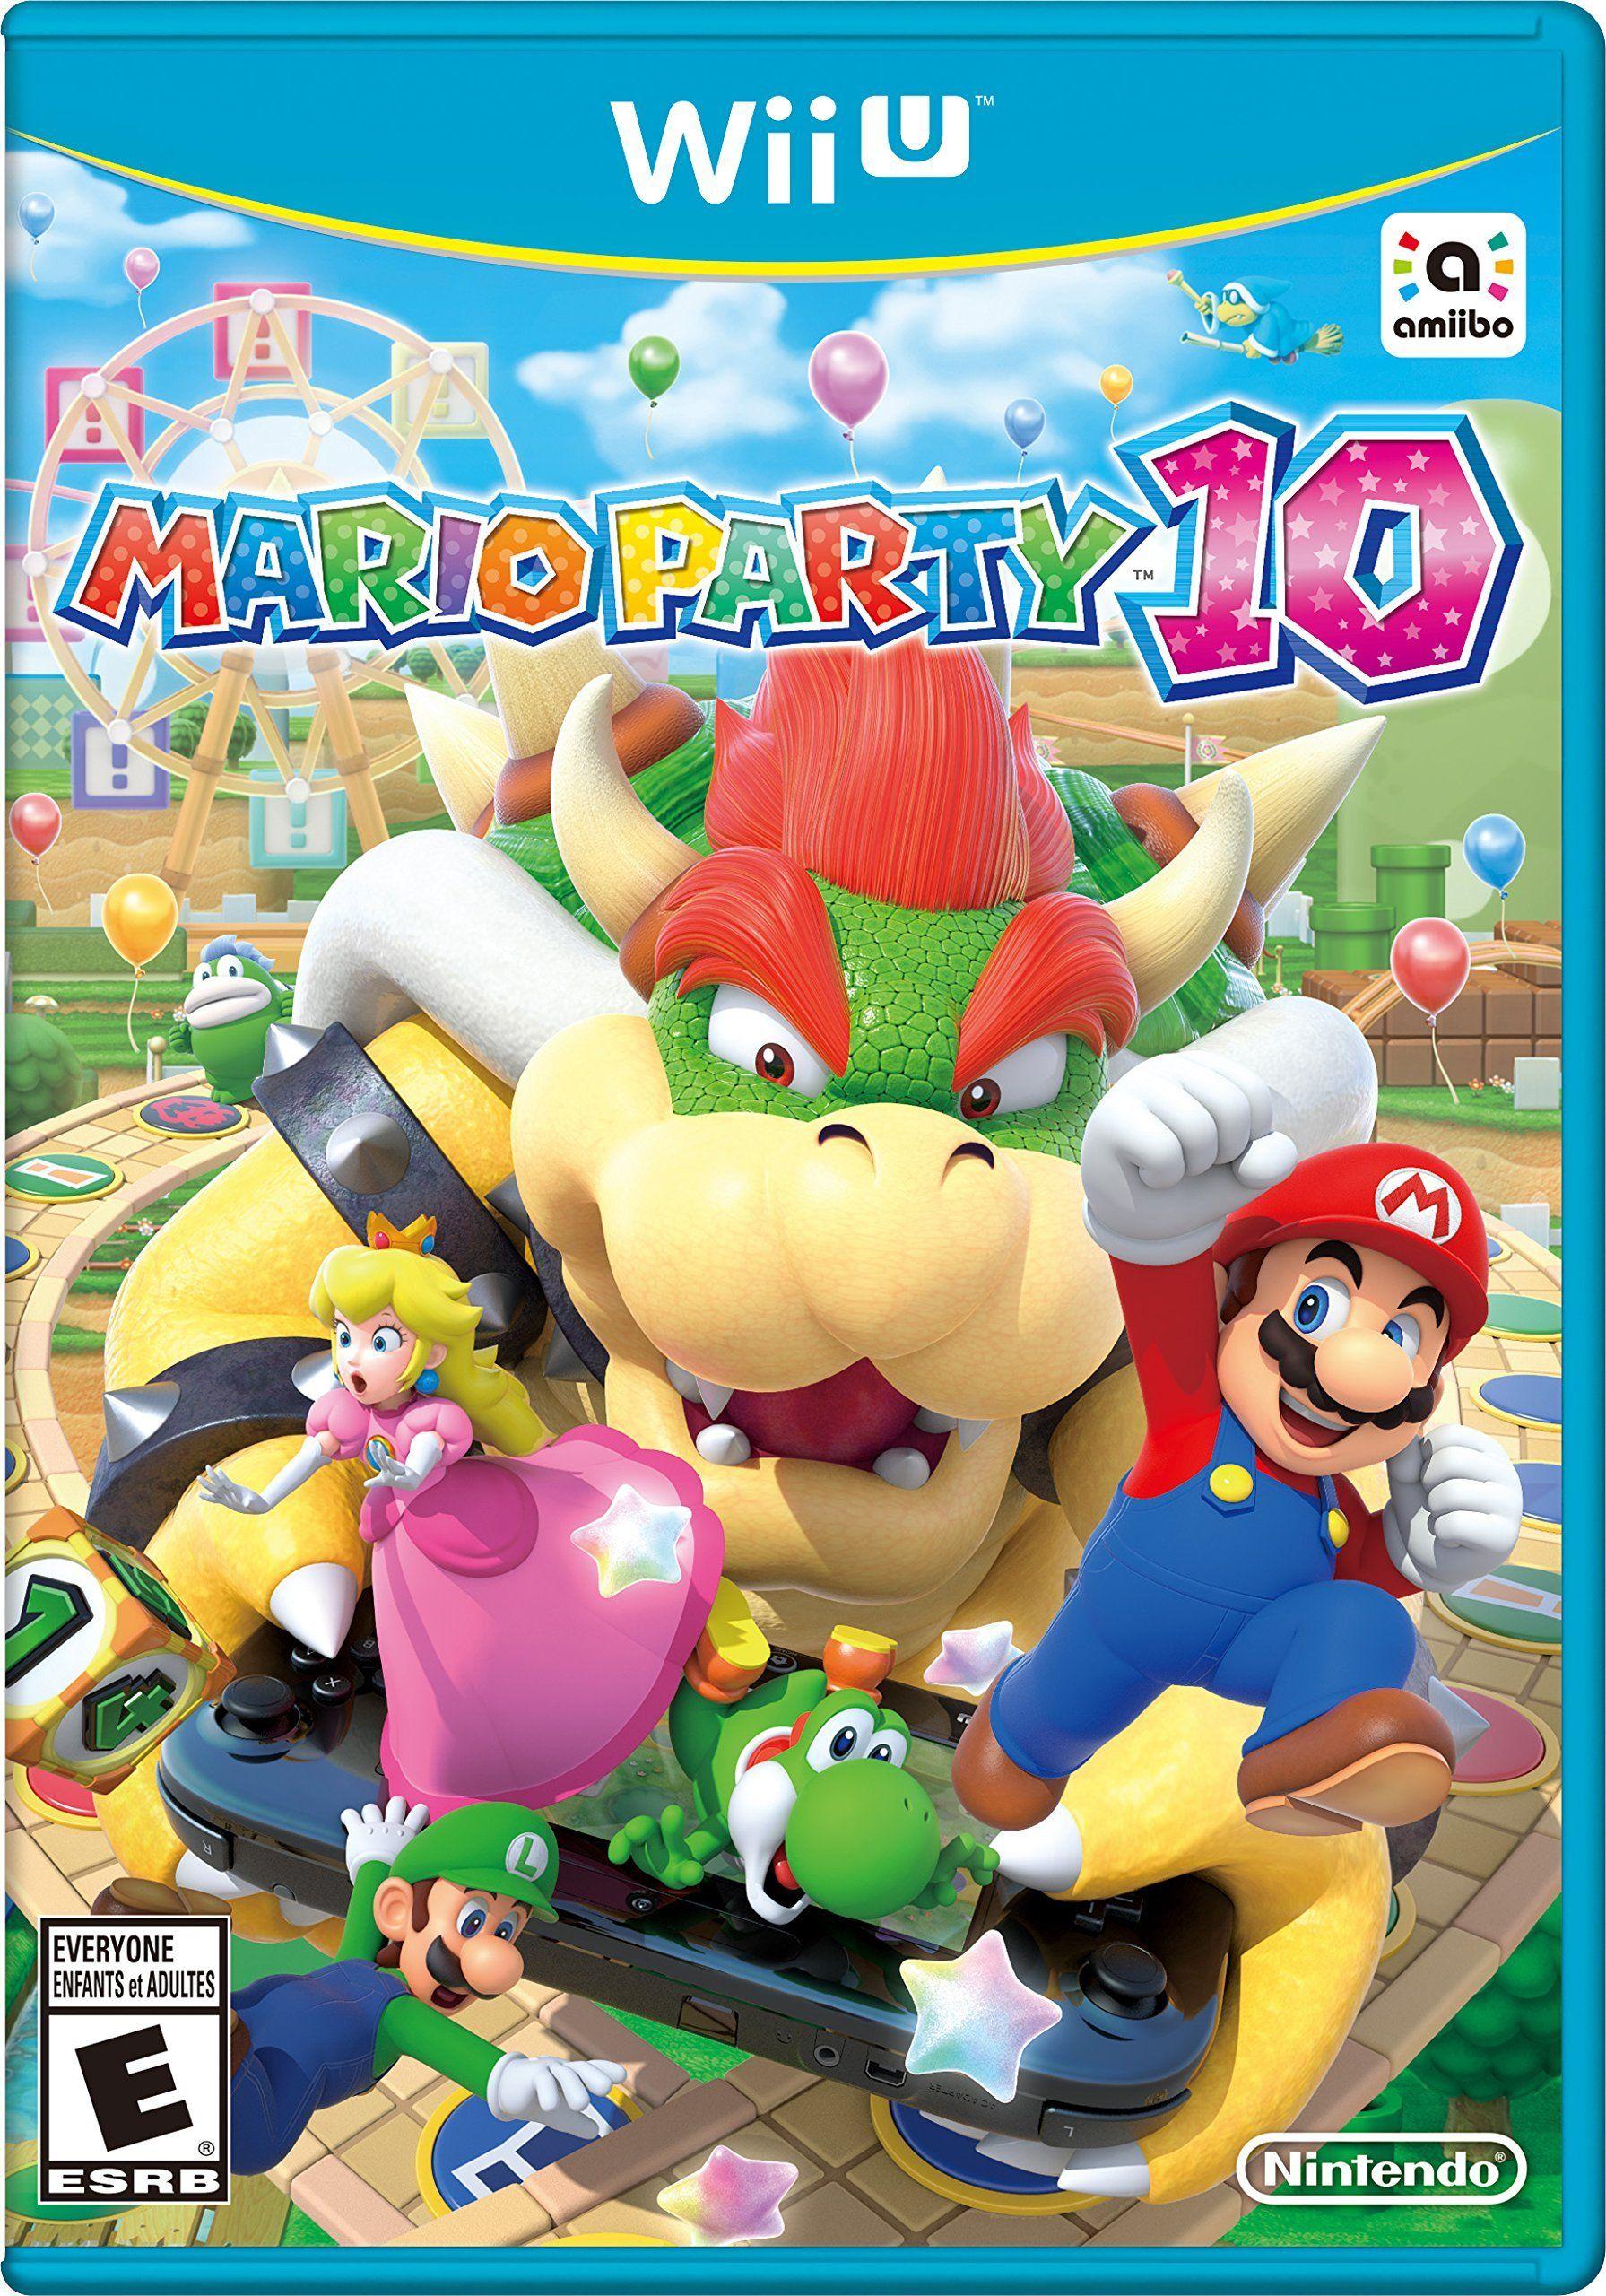 Mario party 10 wii u video games wii u